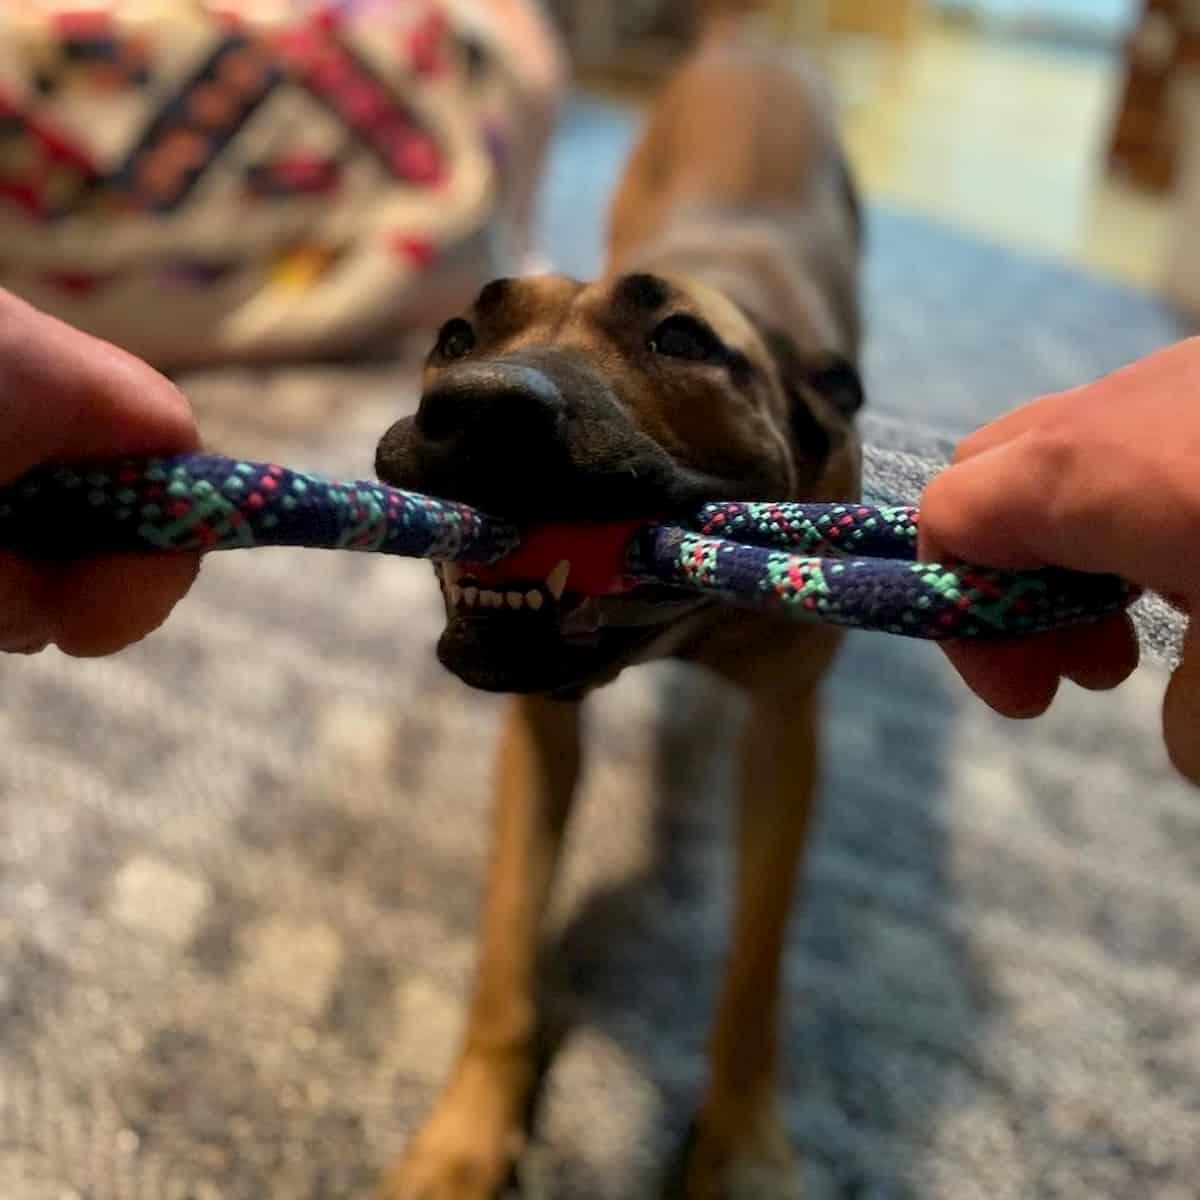 cadela a brincar com corda